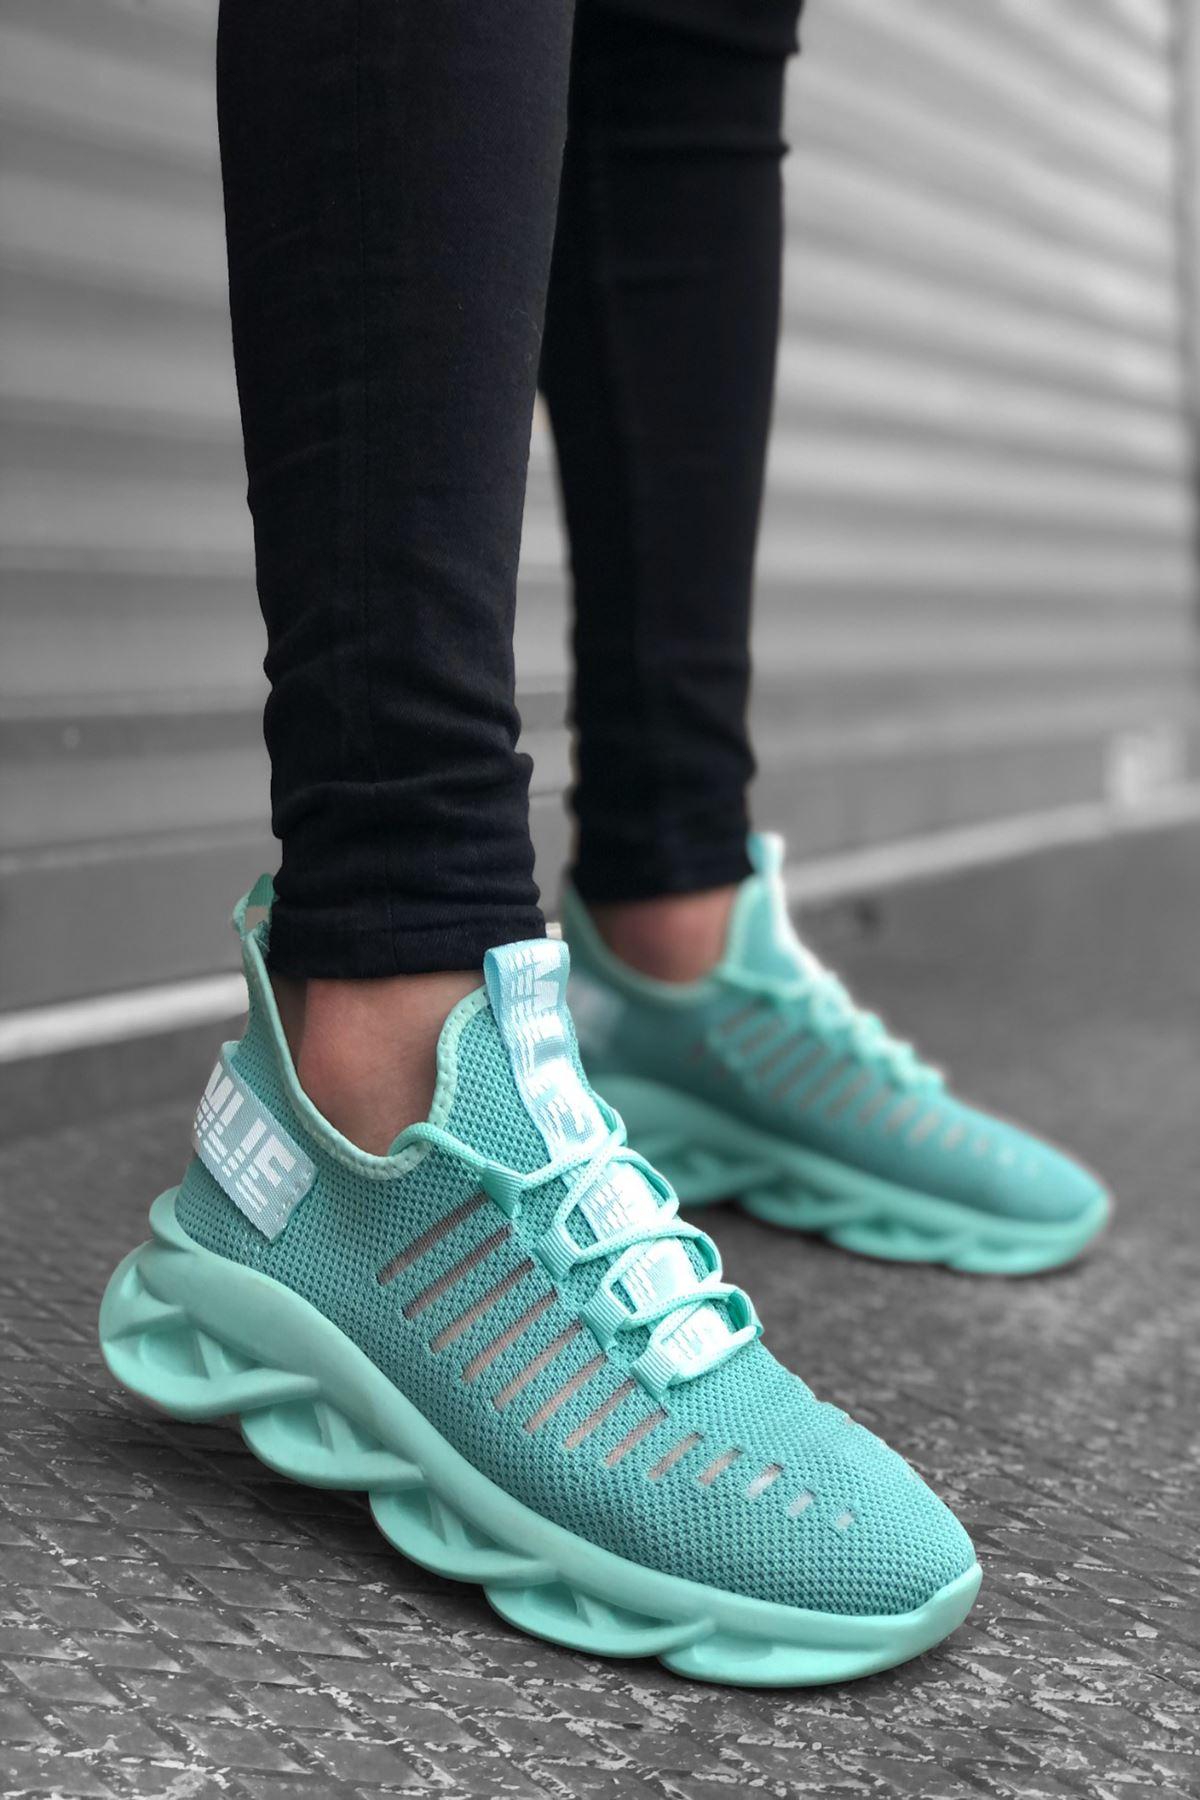 B602 Mint Yeşili Bağcıklı Erkek Sneakers